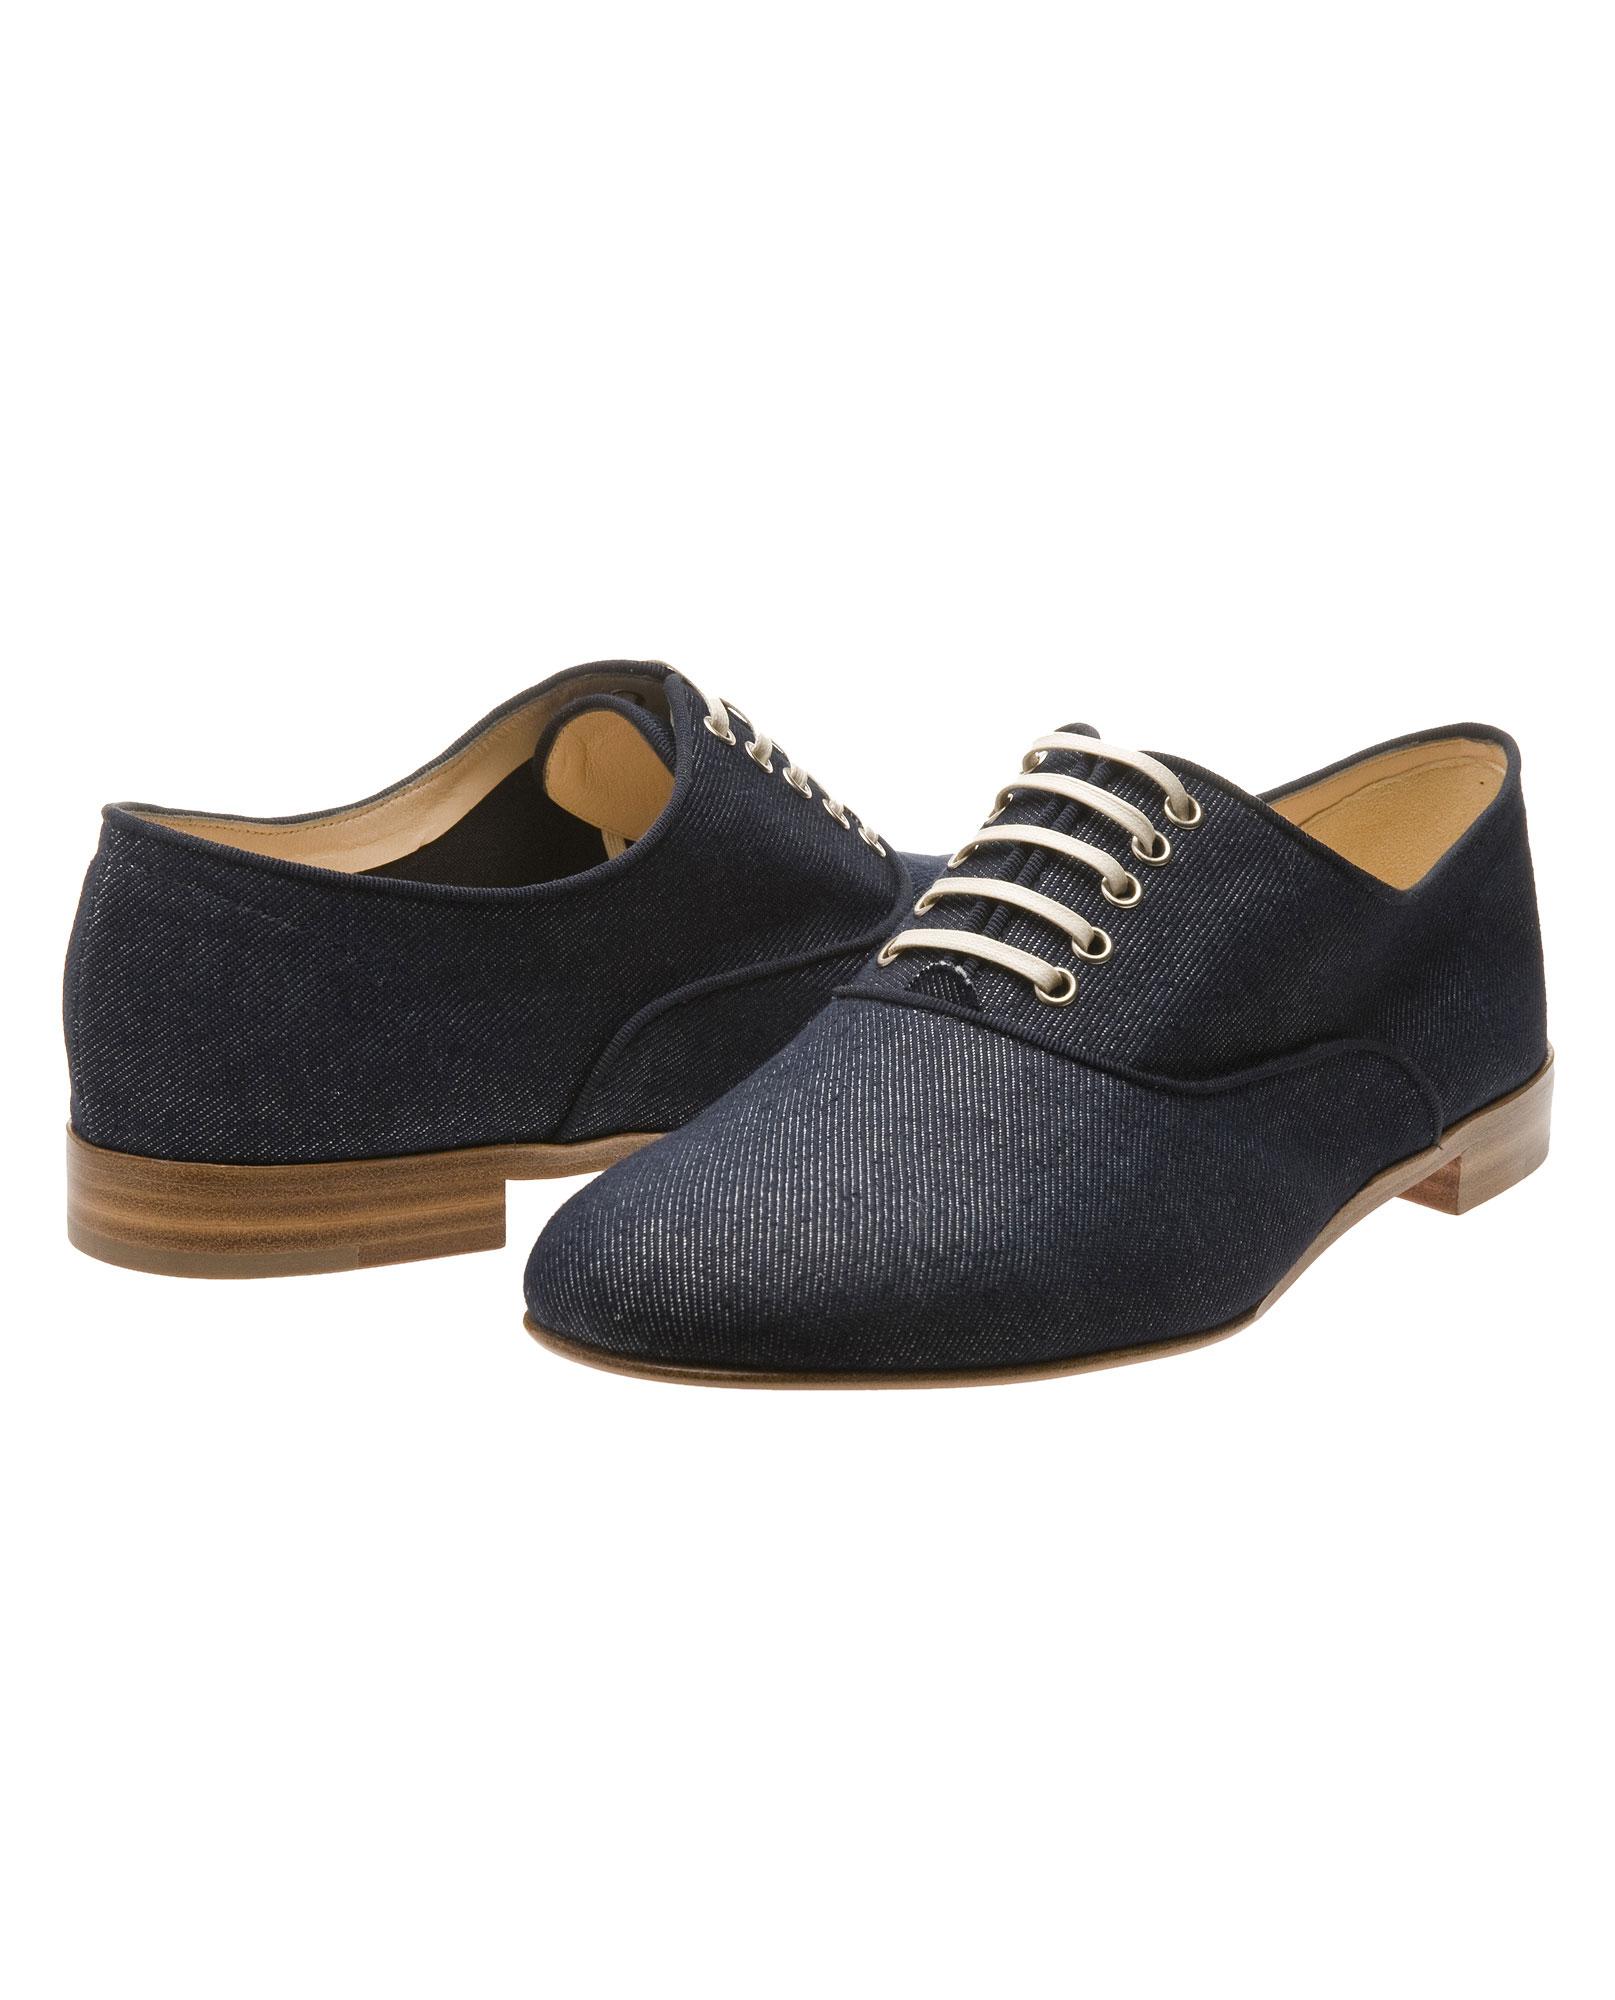 louboutin shoes fake - christian louboutin fred patent leather shoes   Landenberg ...